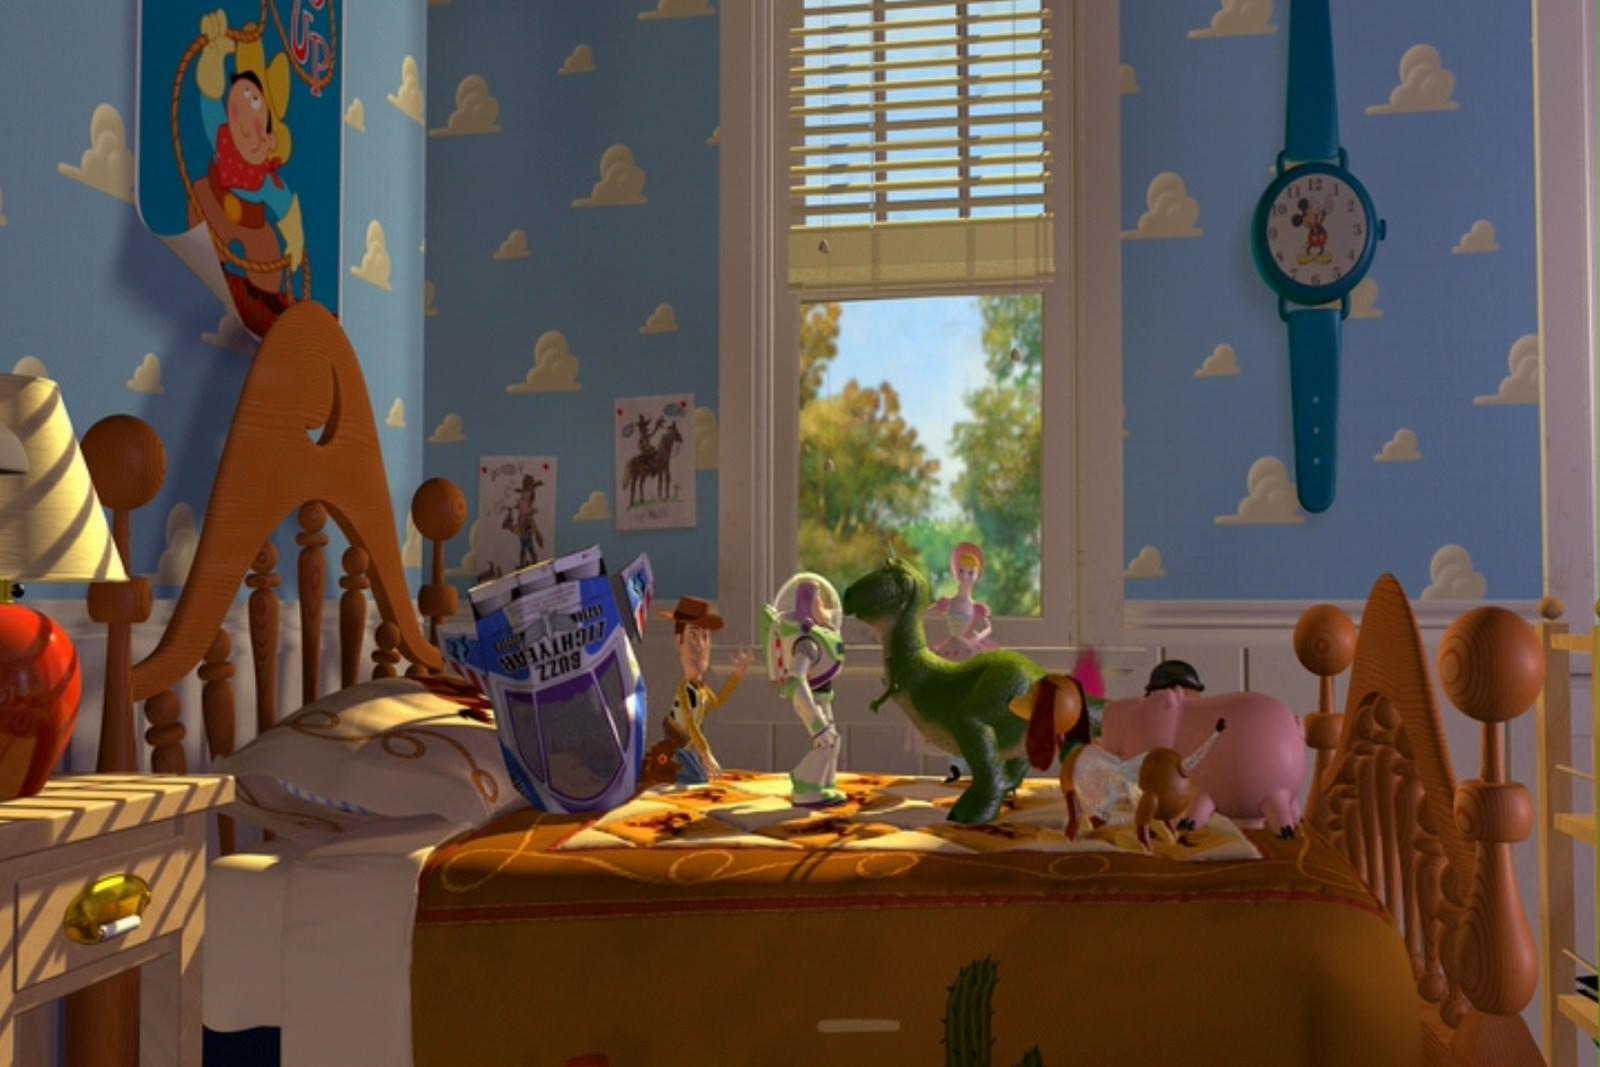 Movie, Toy Story(美國, 1995) / 玩具總動員(台灣) / 玩具总动员(中國) / 反斗奇兵(香港), 電影彩蛋